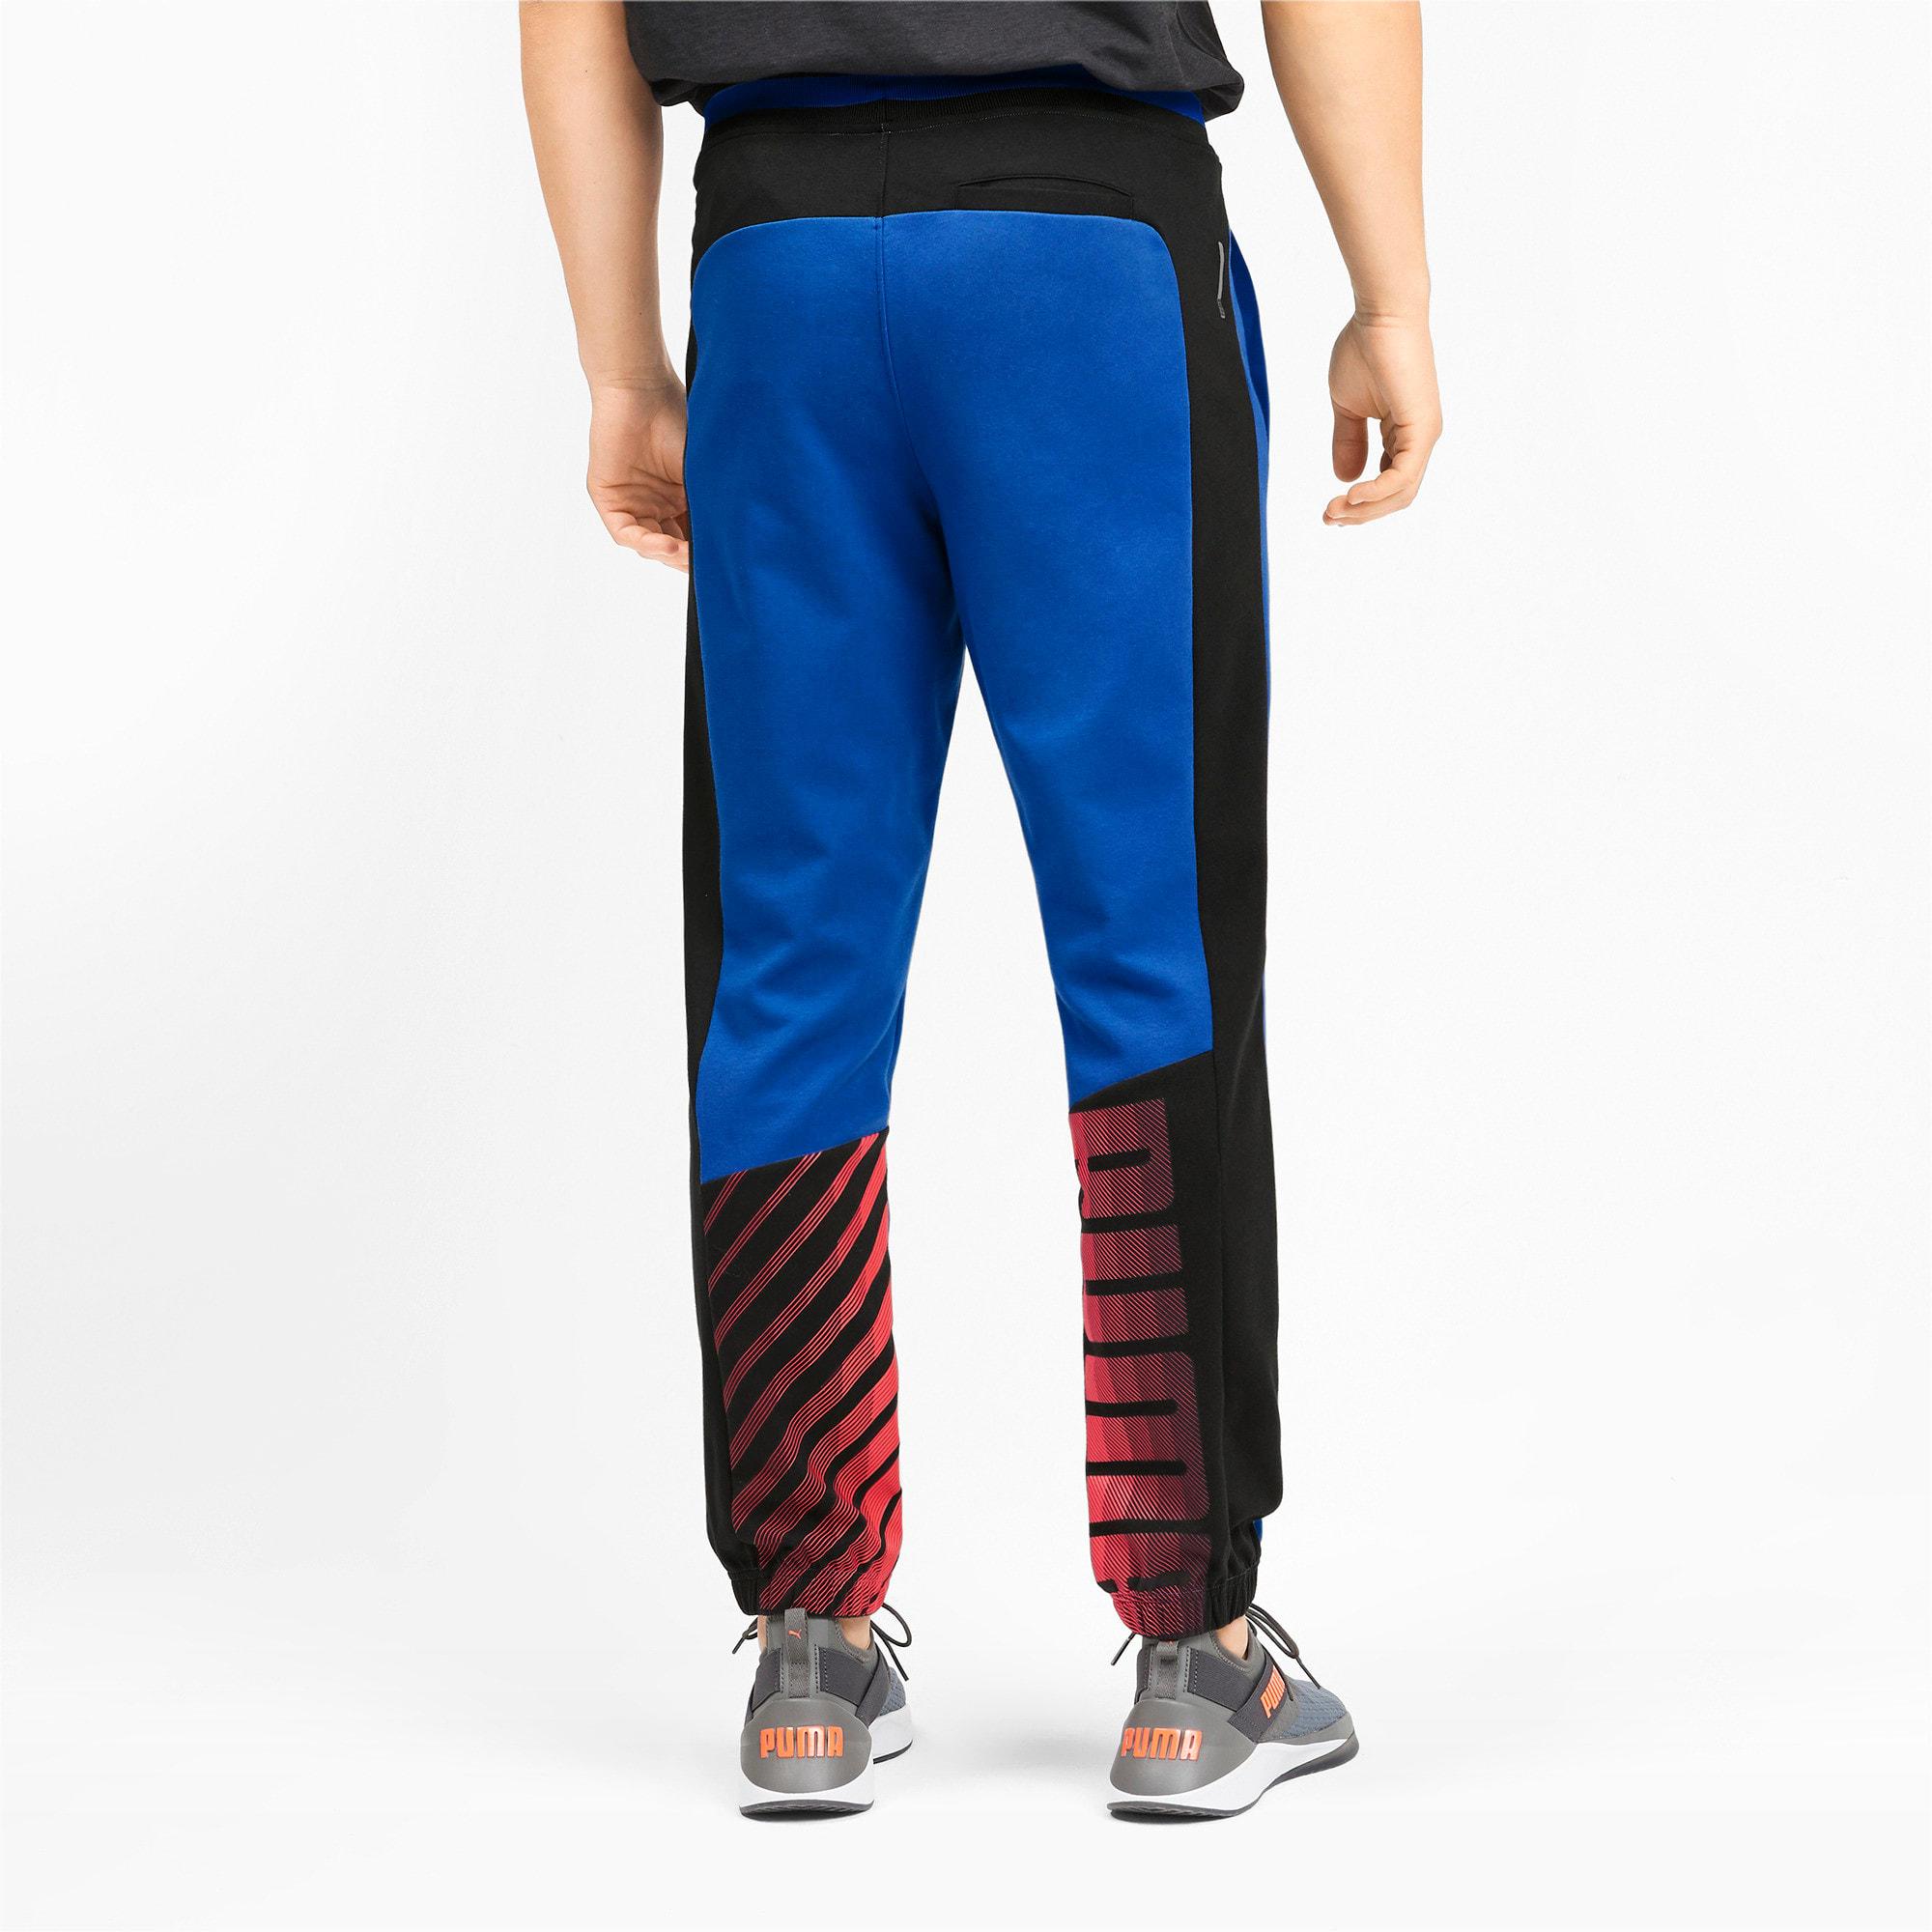 Thumbnail 3 of Collective Men's Sweatpants, Galaxy Blue, medium